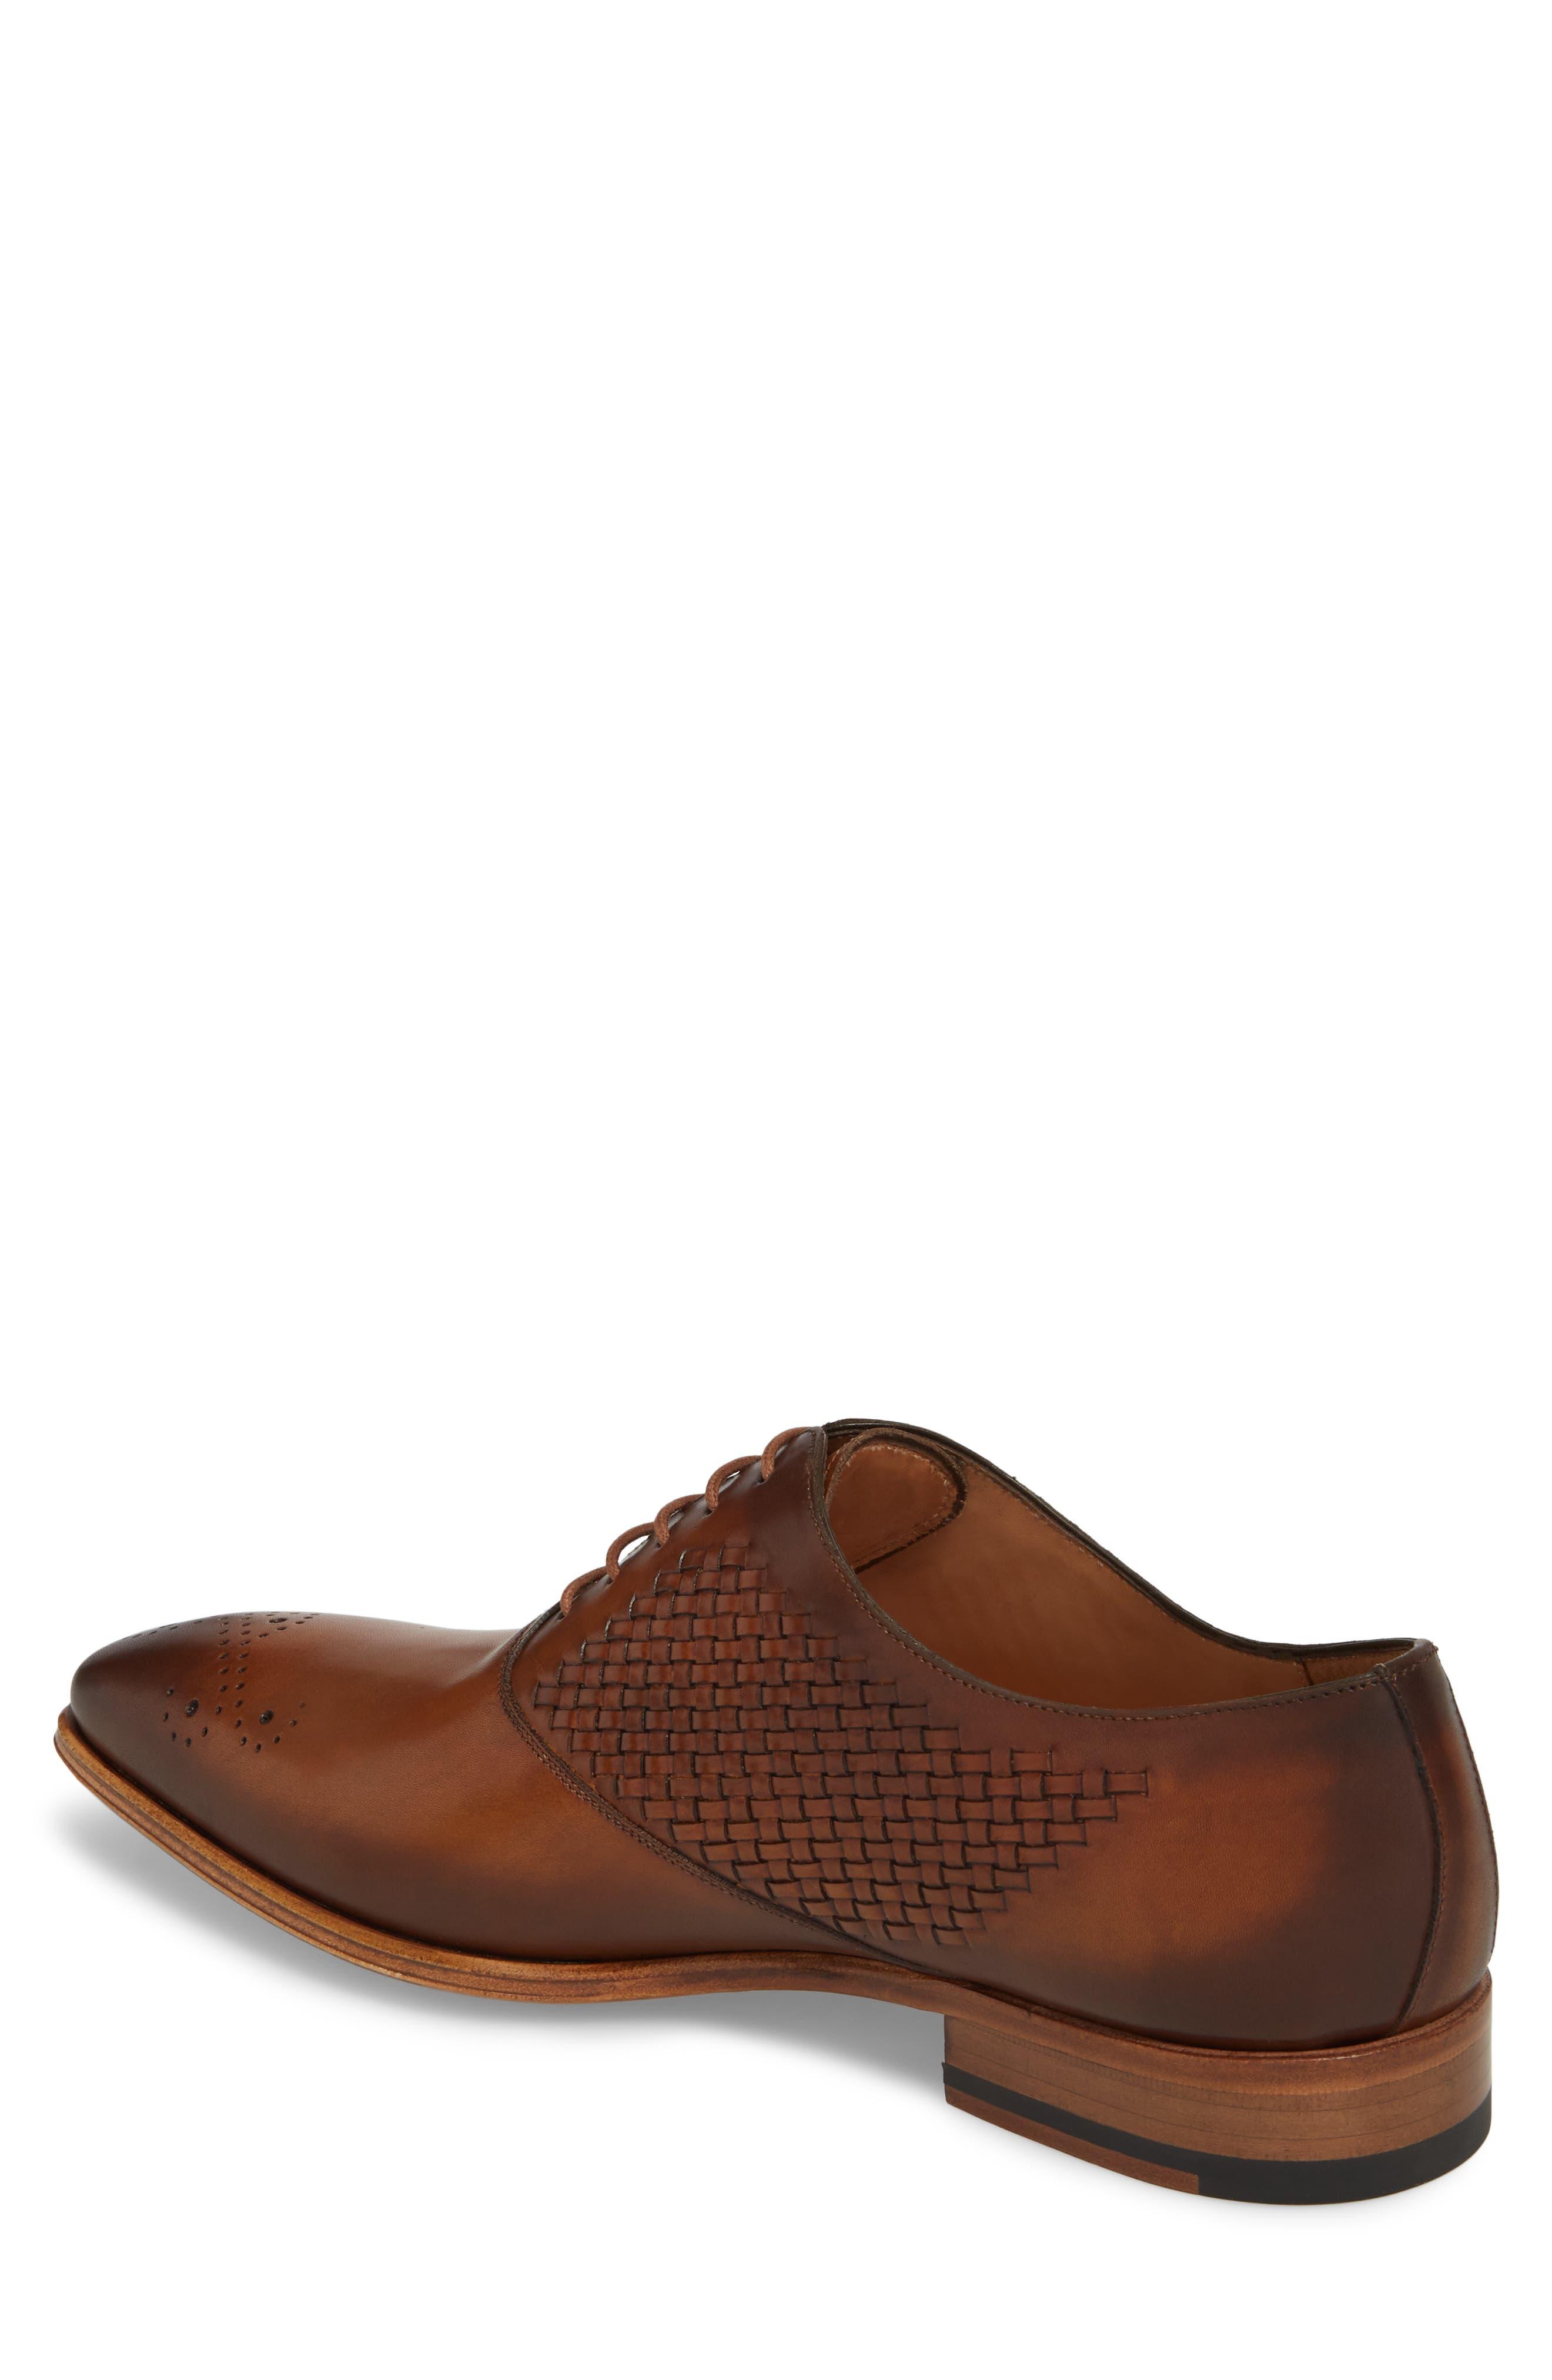 Juventa Woven Oxford,                             Alternate thumbnail 2, color,                             Honey Leather